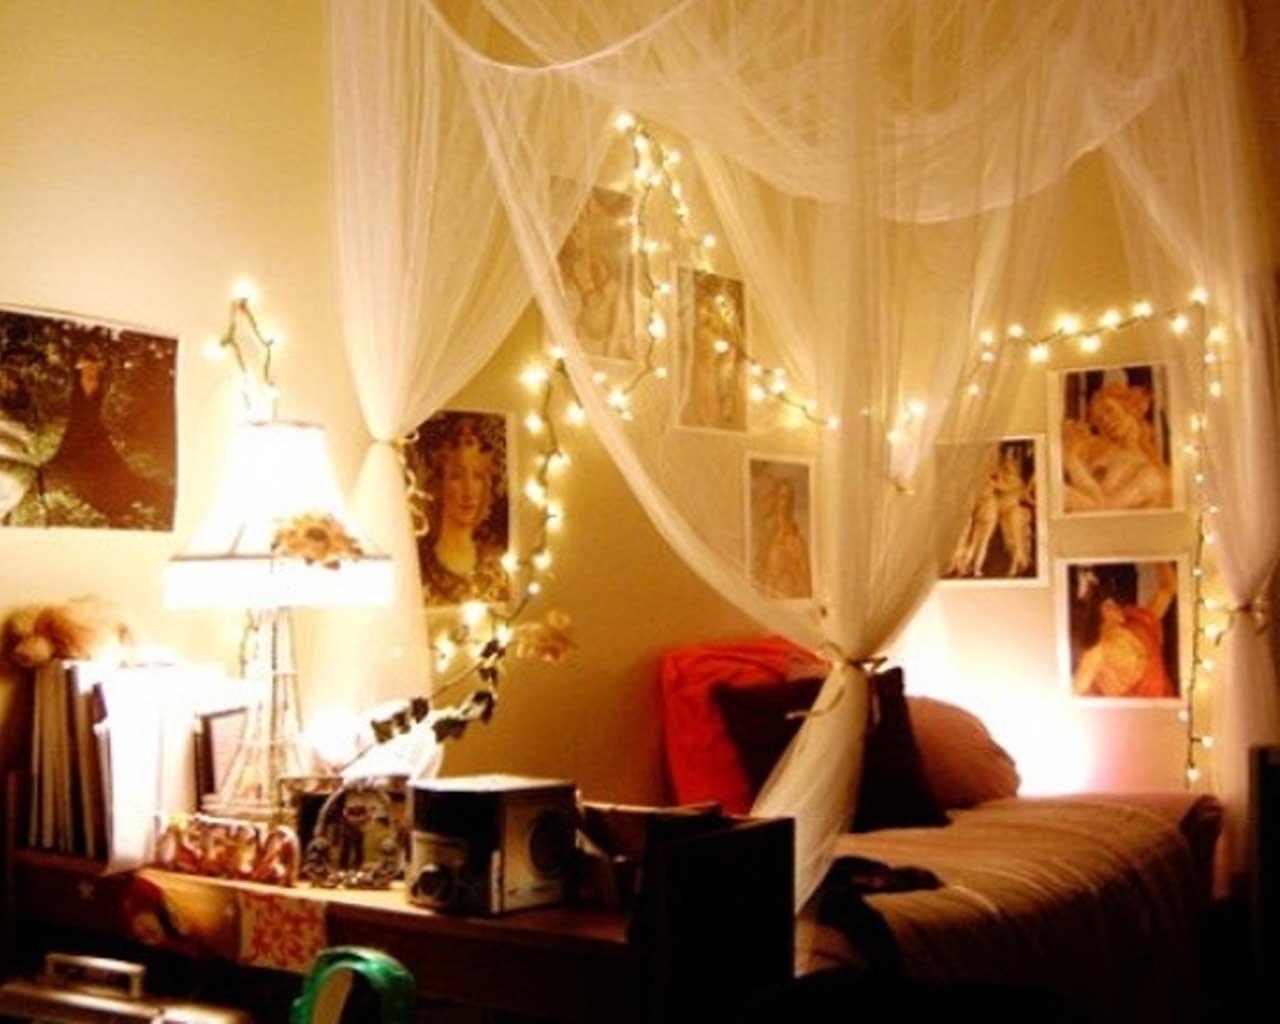 10 Unique Romantic Bedroom Ideas For Valentines Day 10 valentines day bedroom decorating ideas san francisco home decor 2020